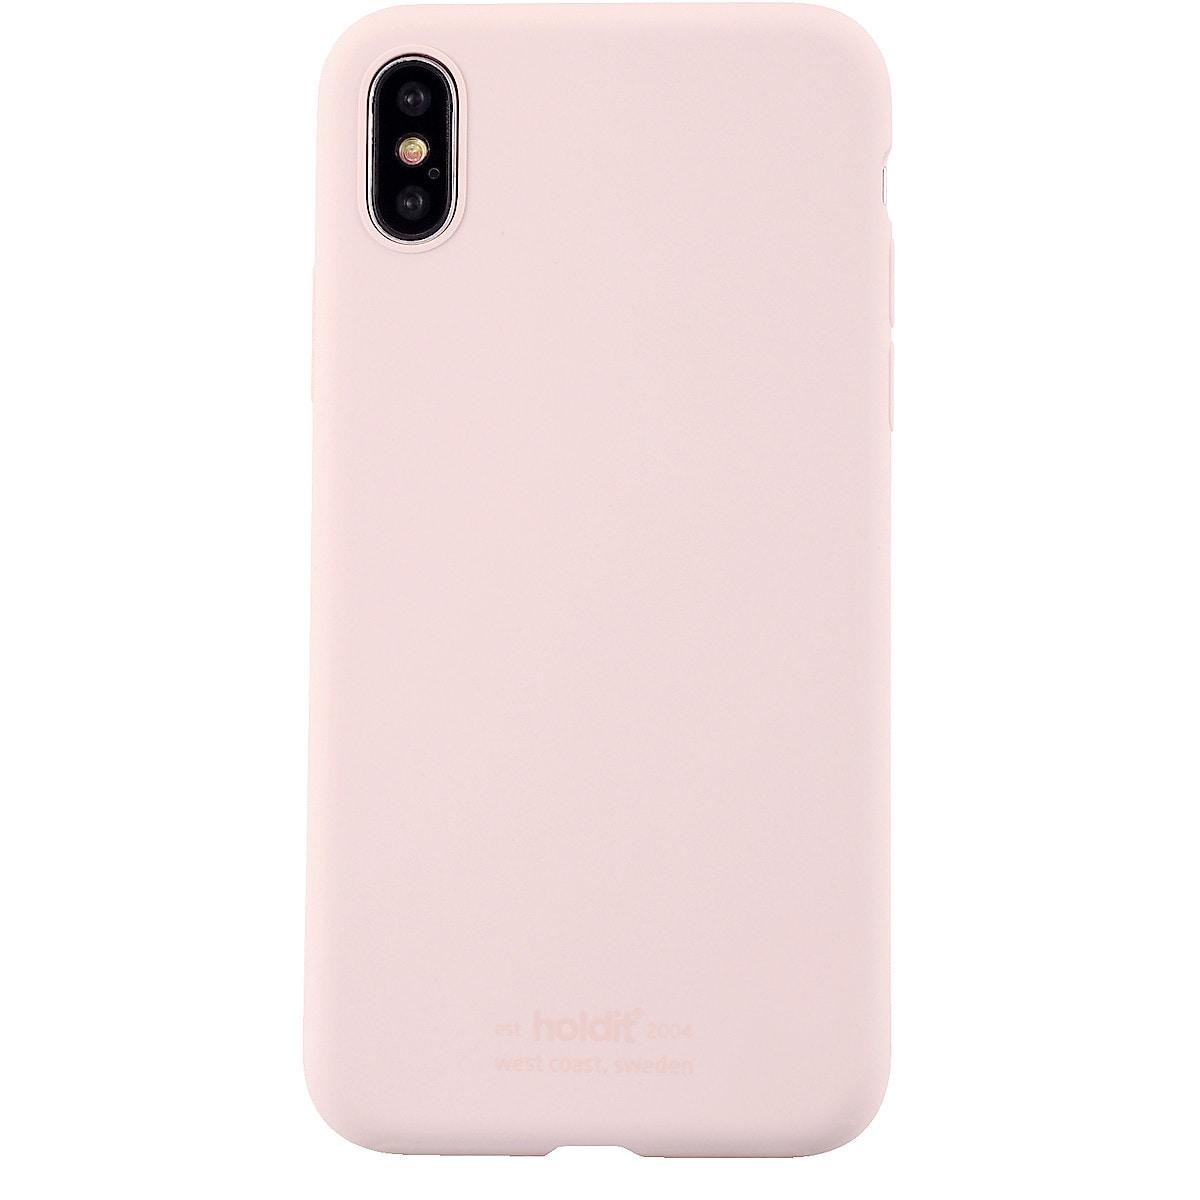 Holdit deksel i silikon for iPhone X/XS